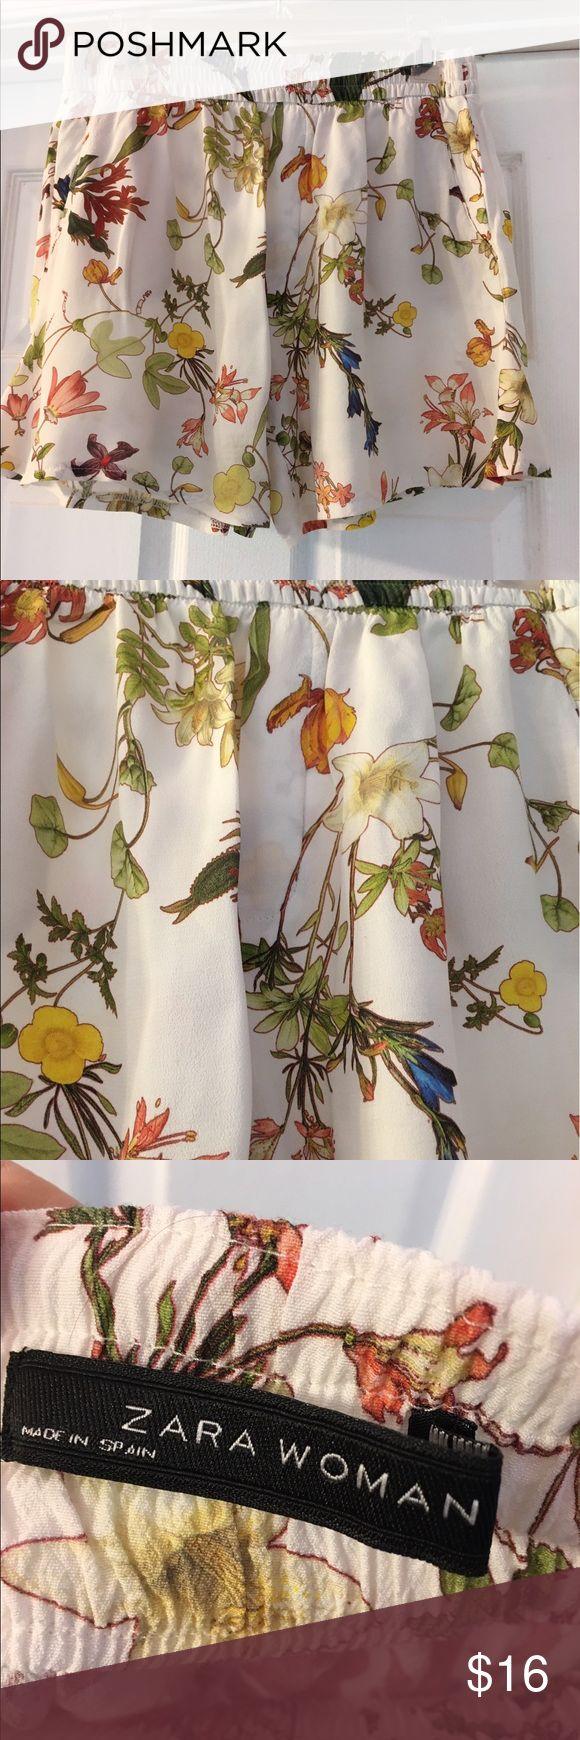 🌺 🌺 Zara women floral shorts 🌺 🌺 Lightweight floral shorts, great like new condition.Elastic waist. Zara Shorts